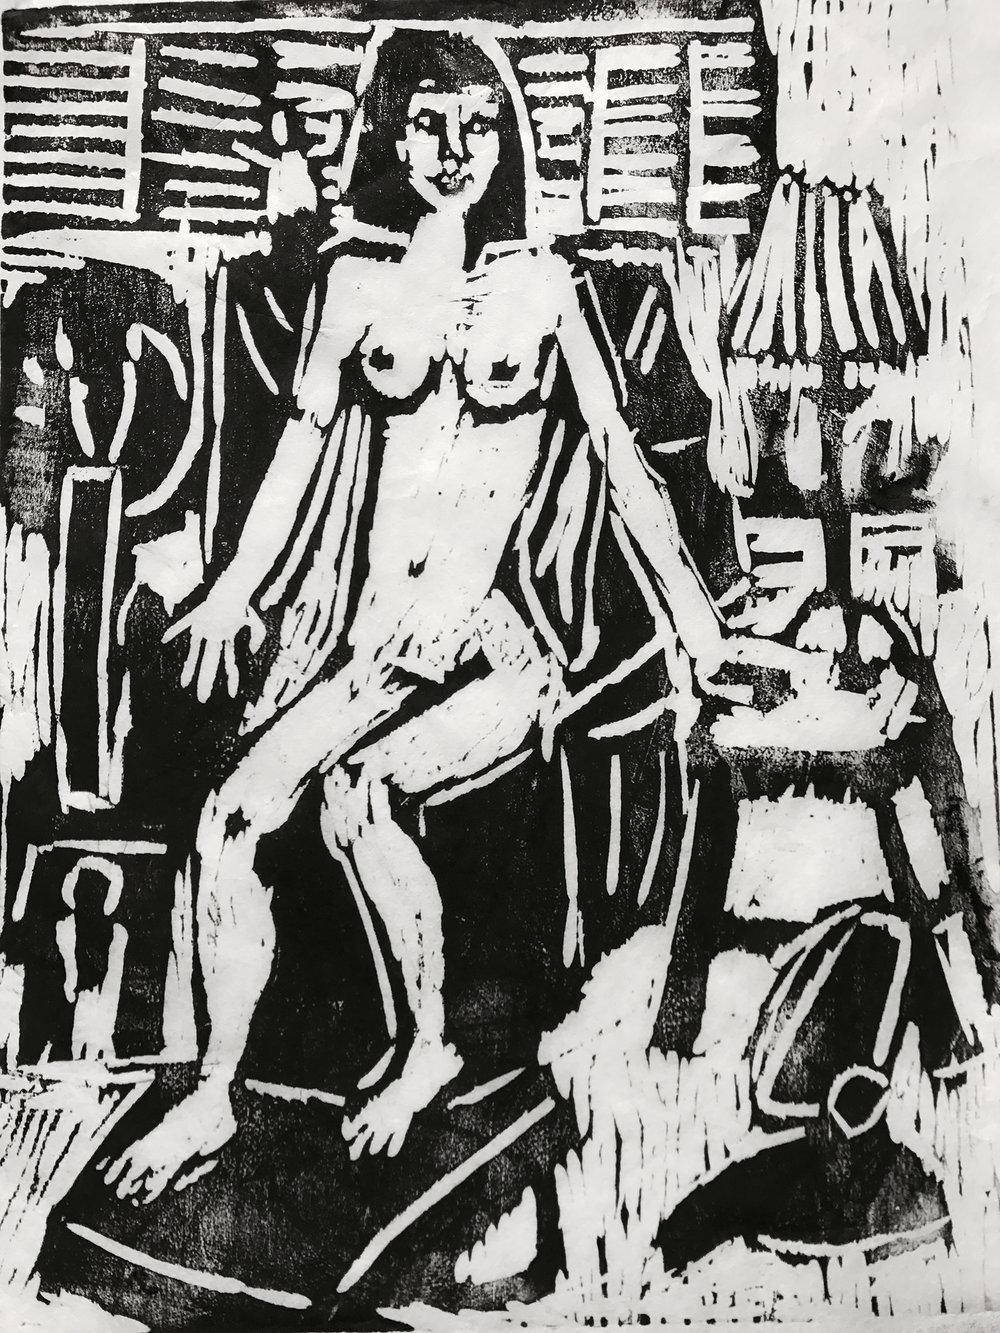 """Chauna"", linoleum block print, 16""x20"", 2018"